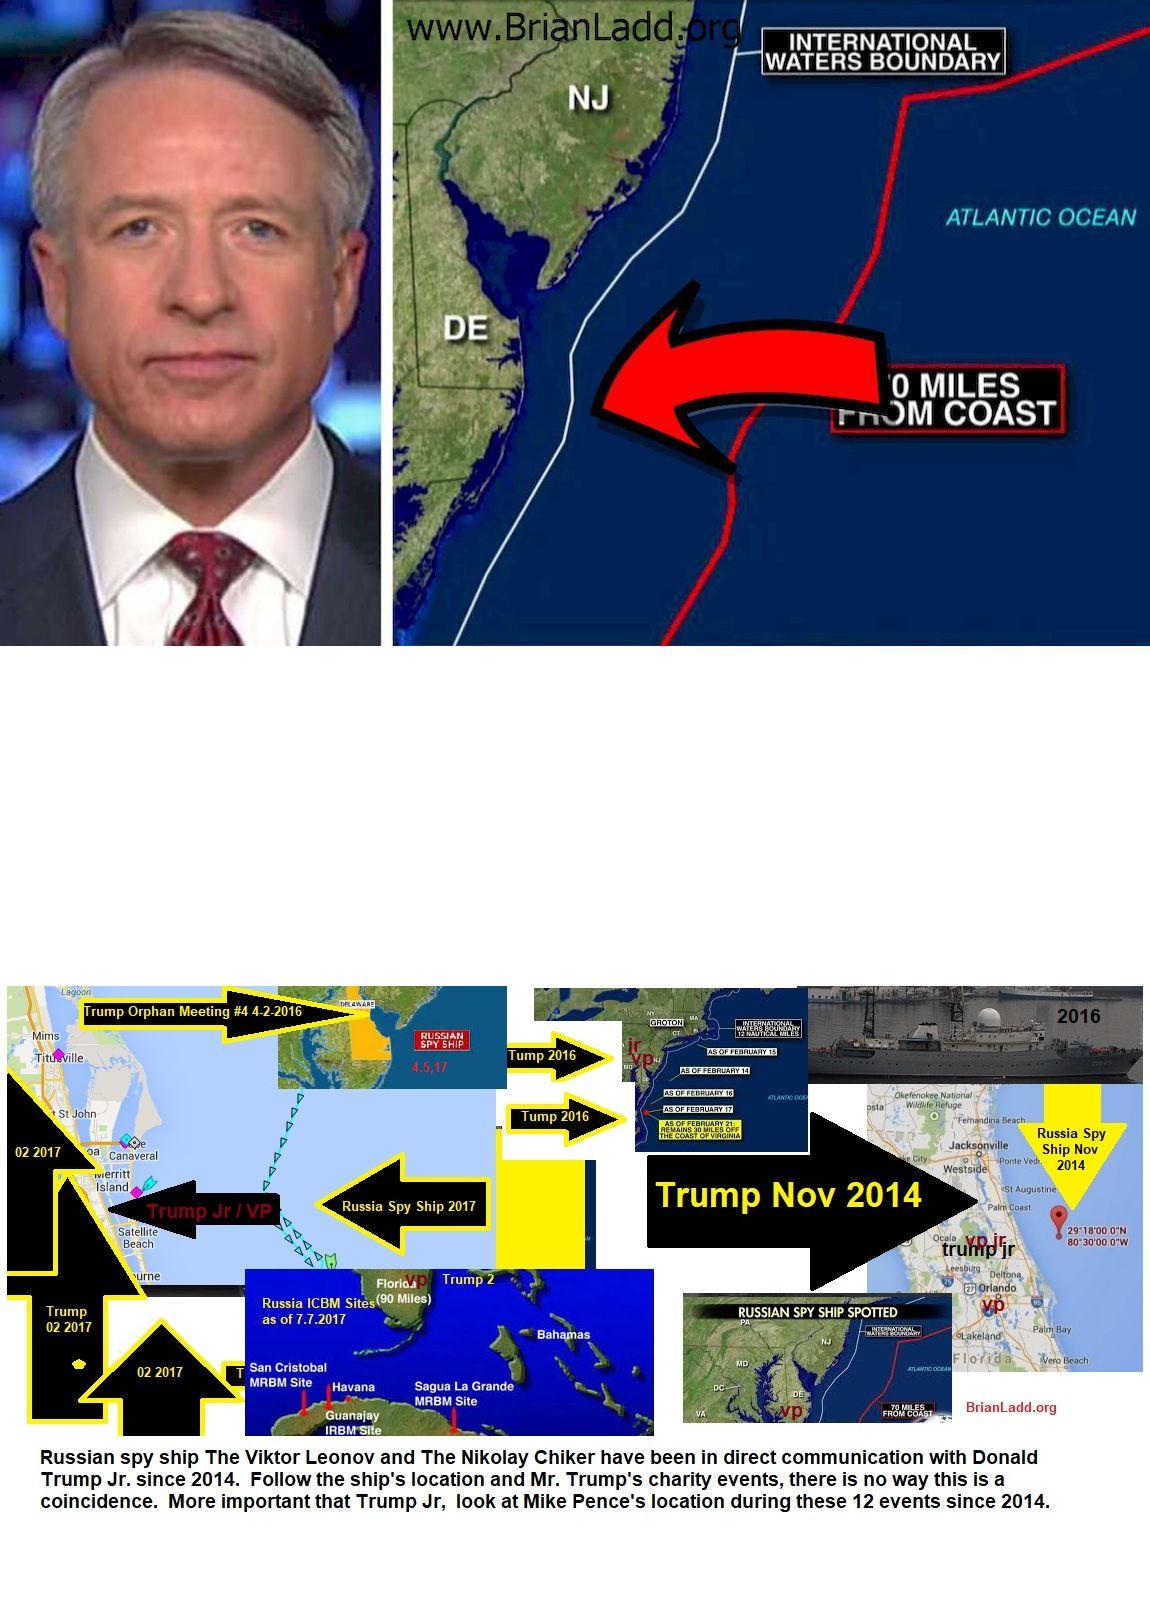 images_q=tbn_ANd223GcRfjpZzhAaFLM8pKBR2b748mBCB1RQ_7V8BGioBkzj4NVol0dFM6A_russian_spy_ship_acciden.jpg